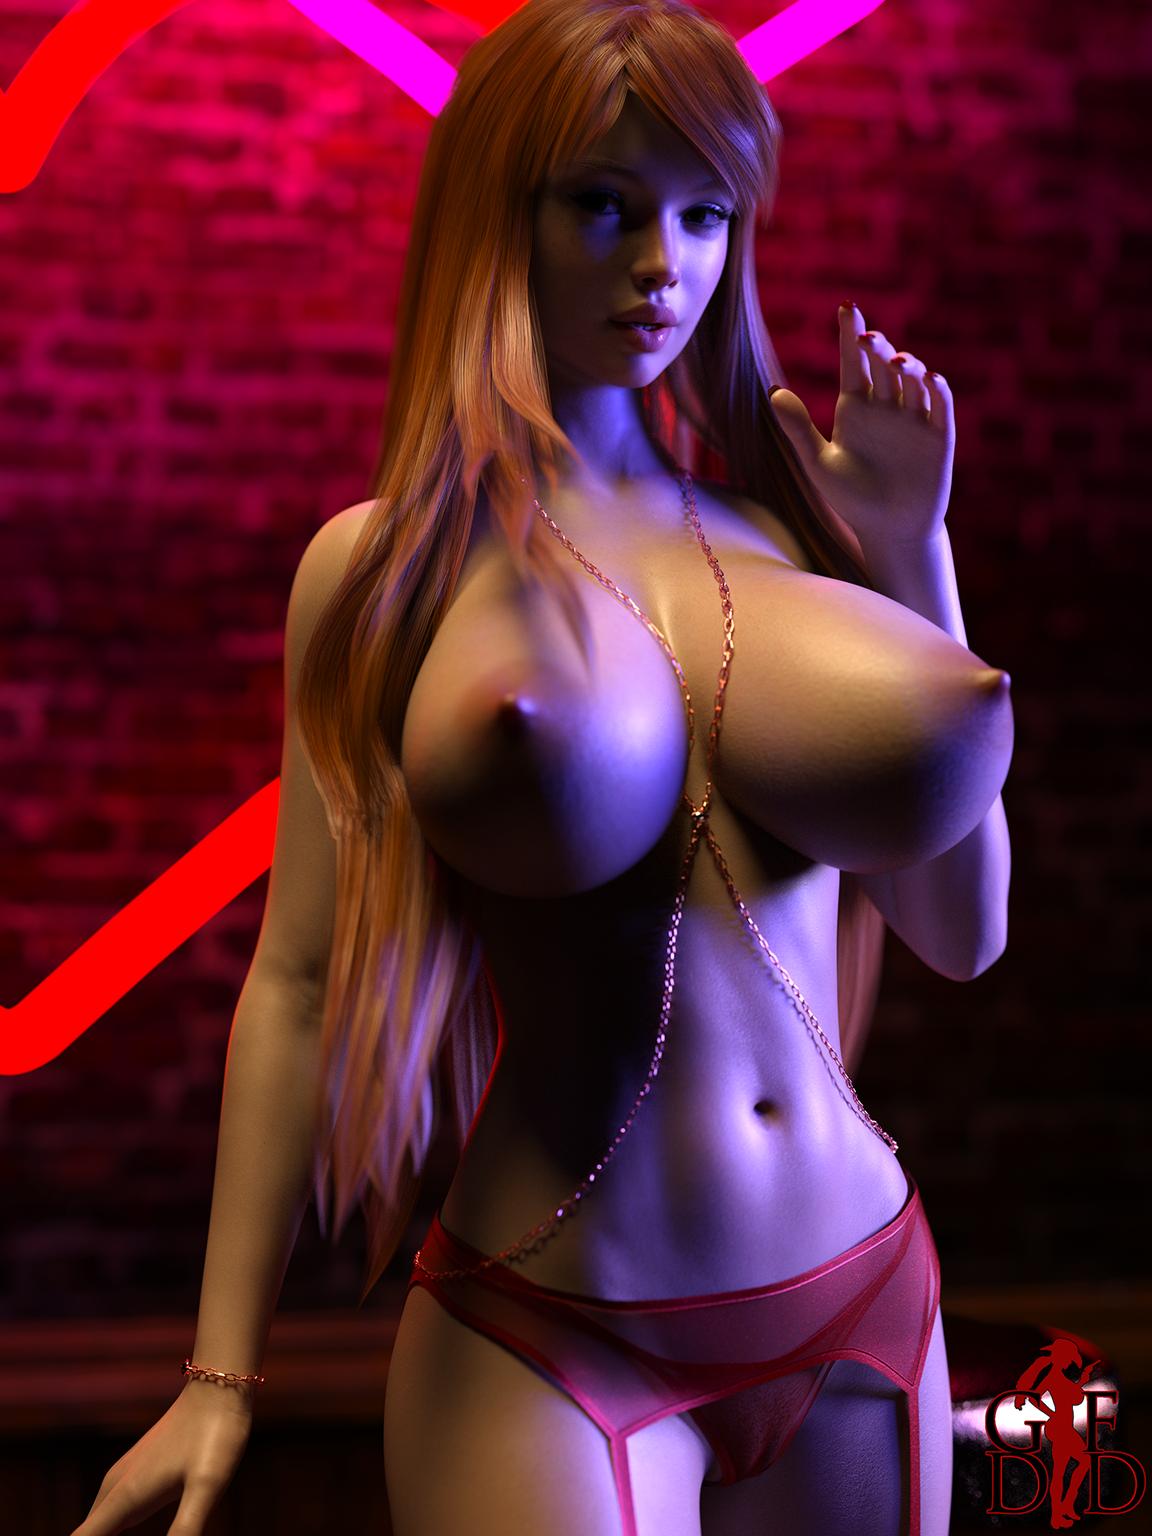 Tiffany at the Night Club